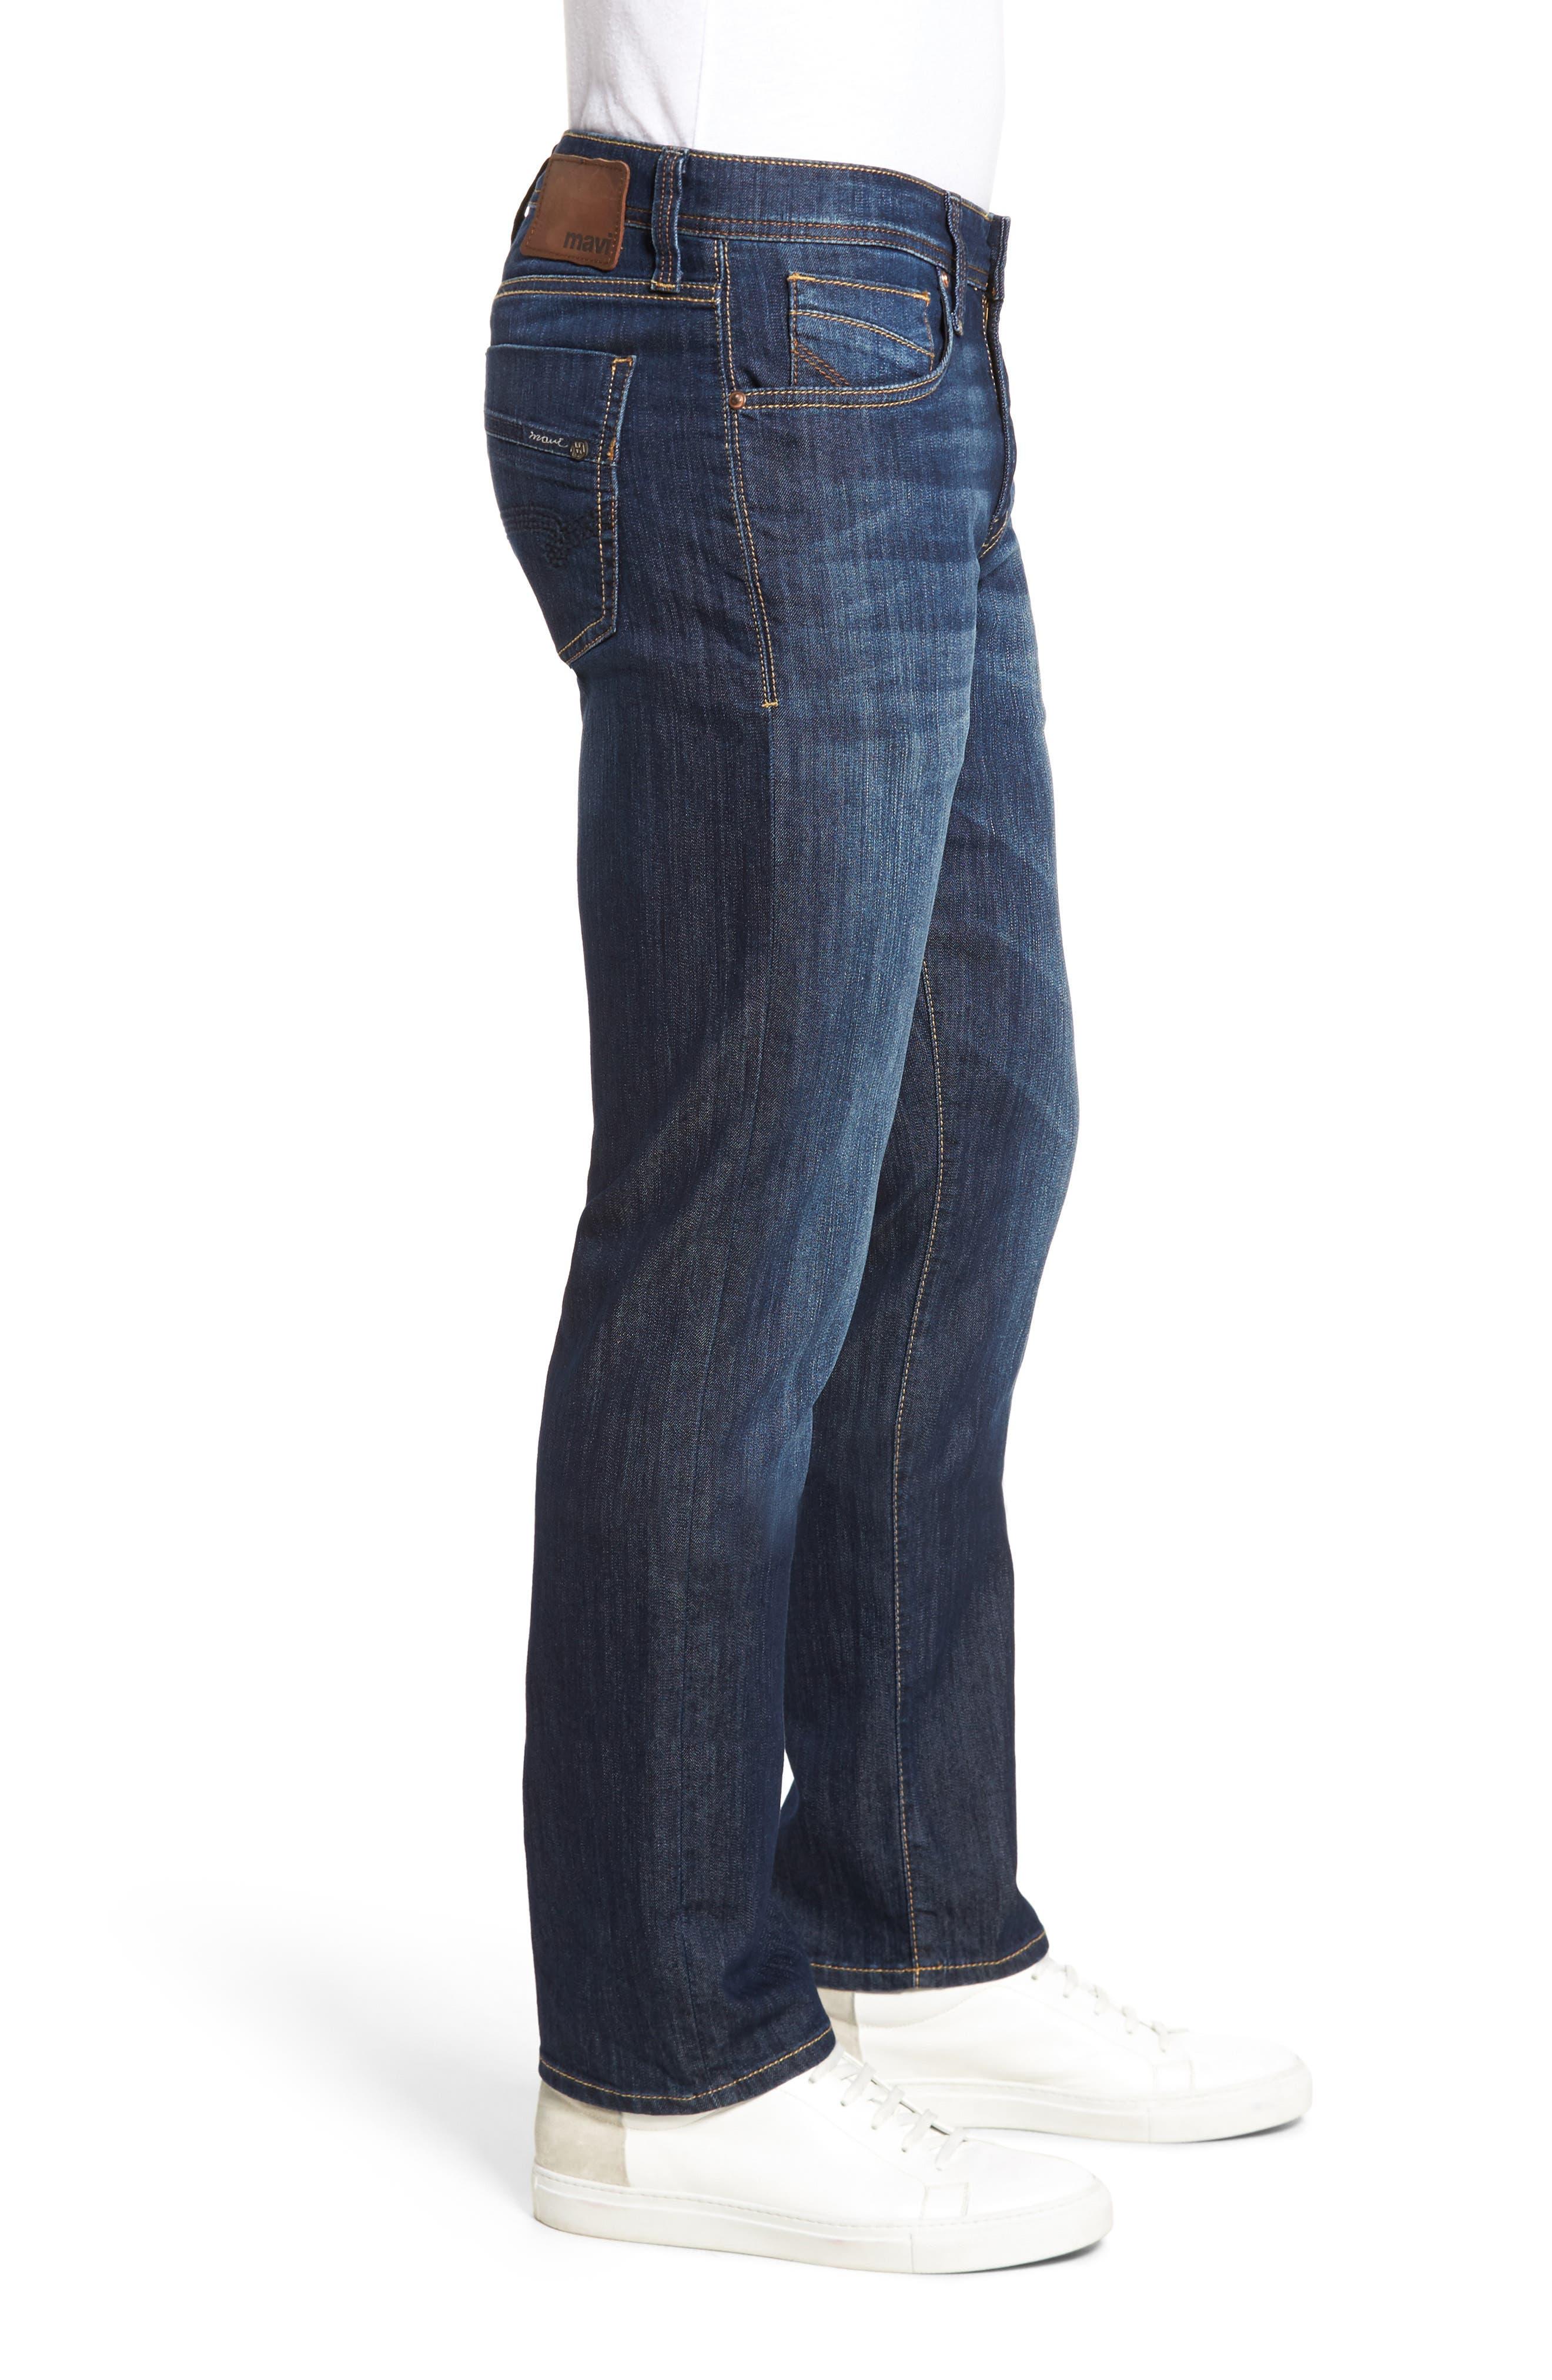 MAVI JEANS, Zach Straight Leg Jeans, Alternate thumbnail 4, color, DARK MAUI